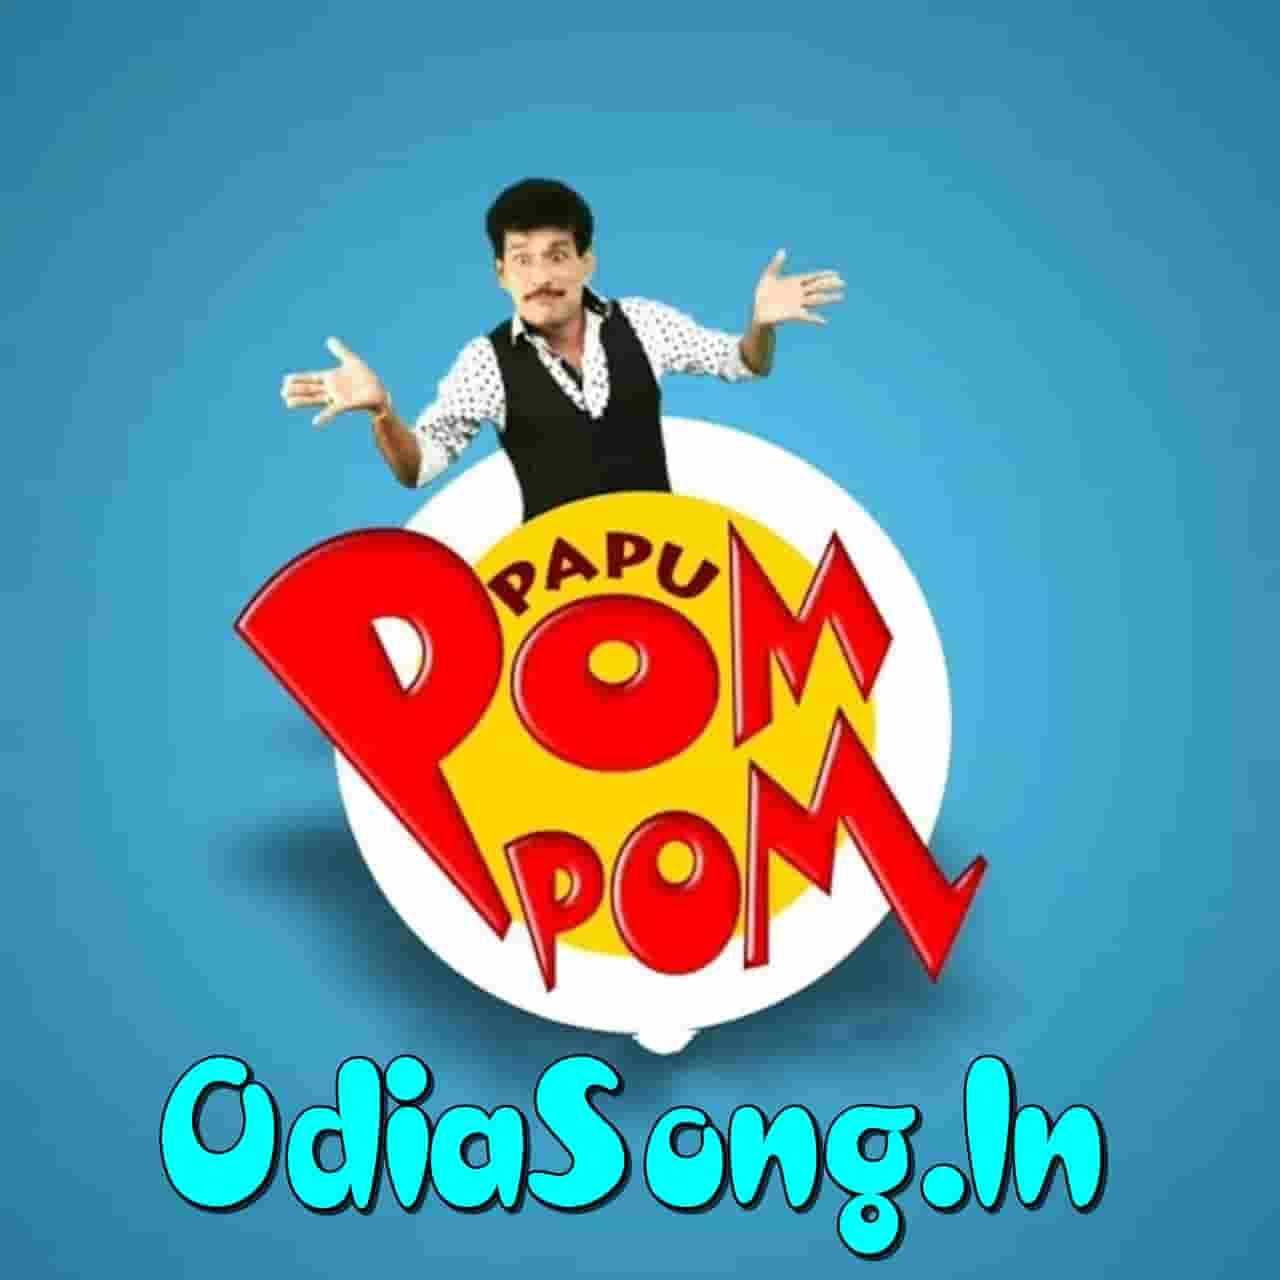 Mun Kuanra Rahigali - Odia Sad Song (Papu Pom Pom)